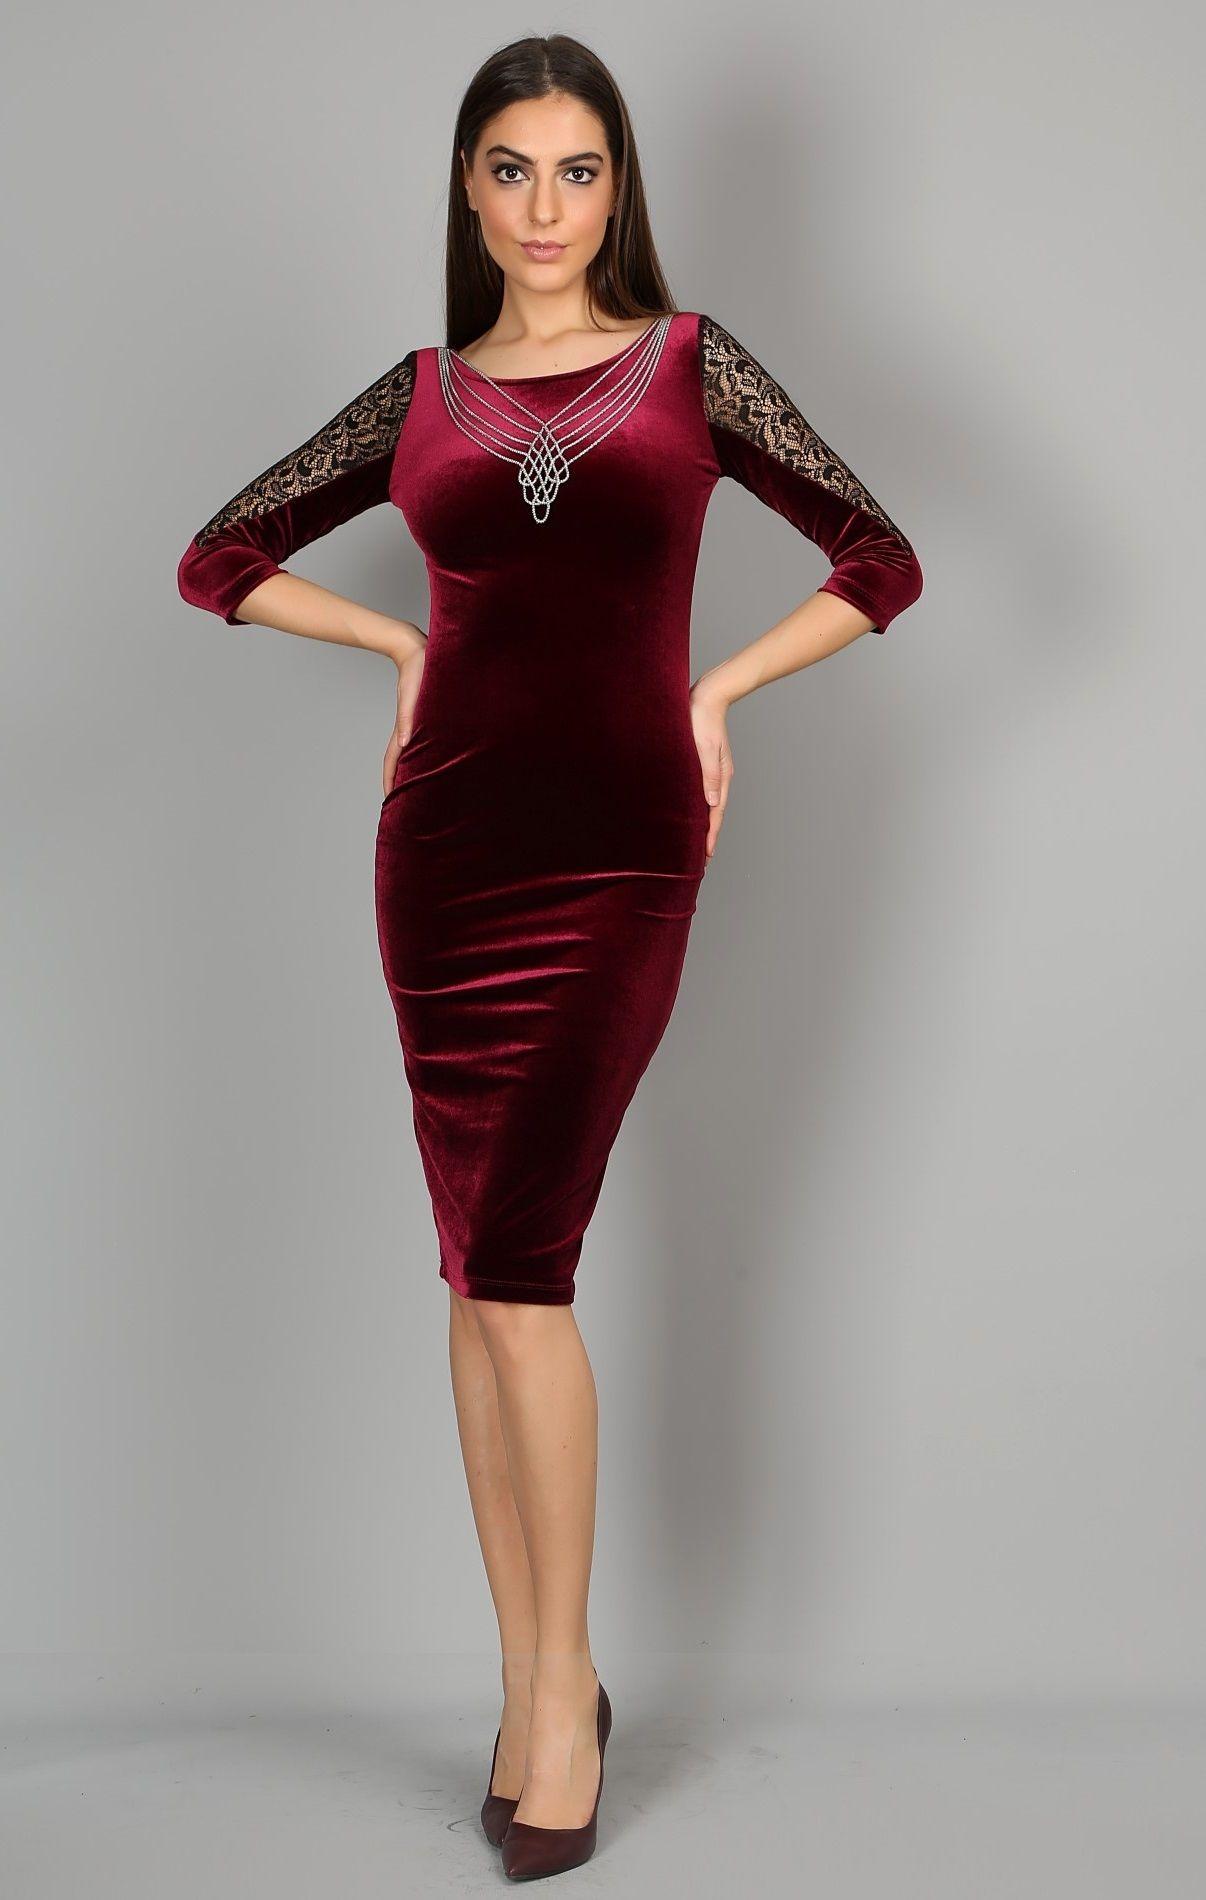 Modelleri ve elbise fiyatlar modasor com pictures to pin on pinterest - 2016 Kadife Elbise Modelleri Http Www Gelinlikvitrini Com 2016